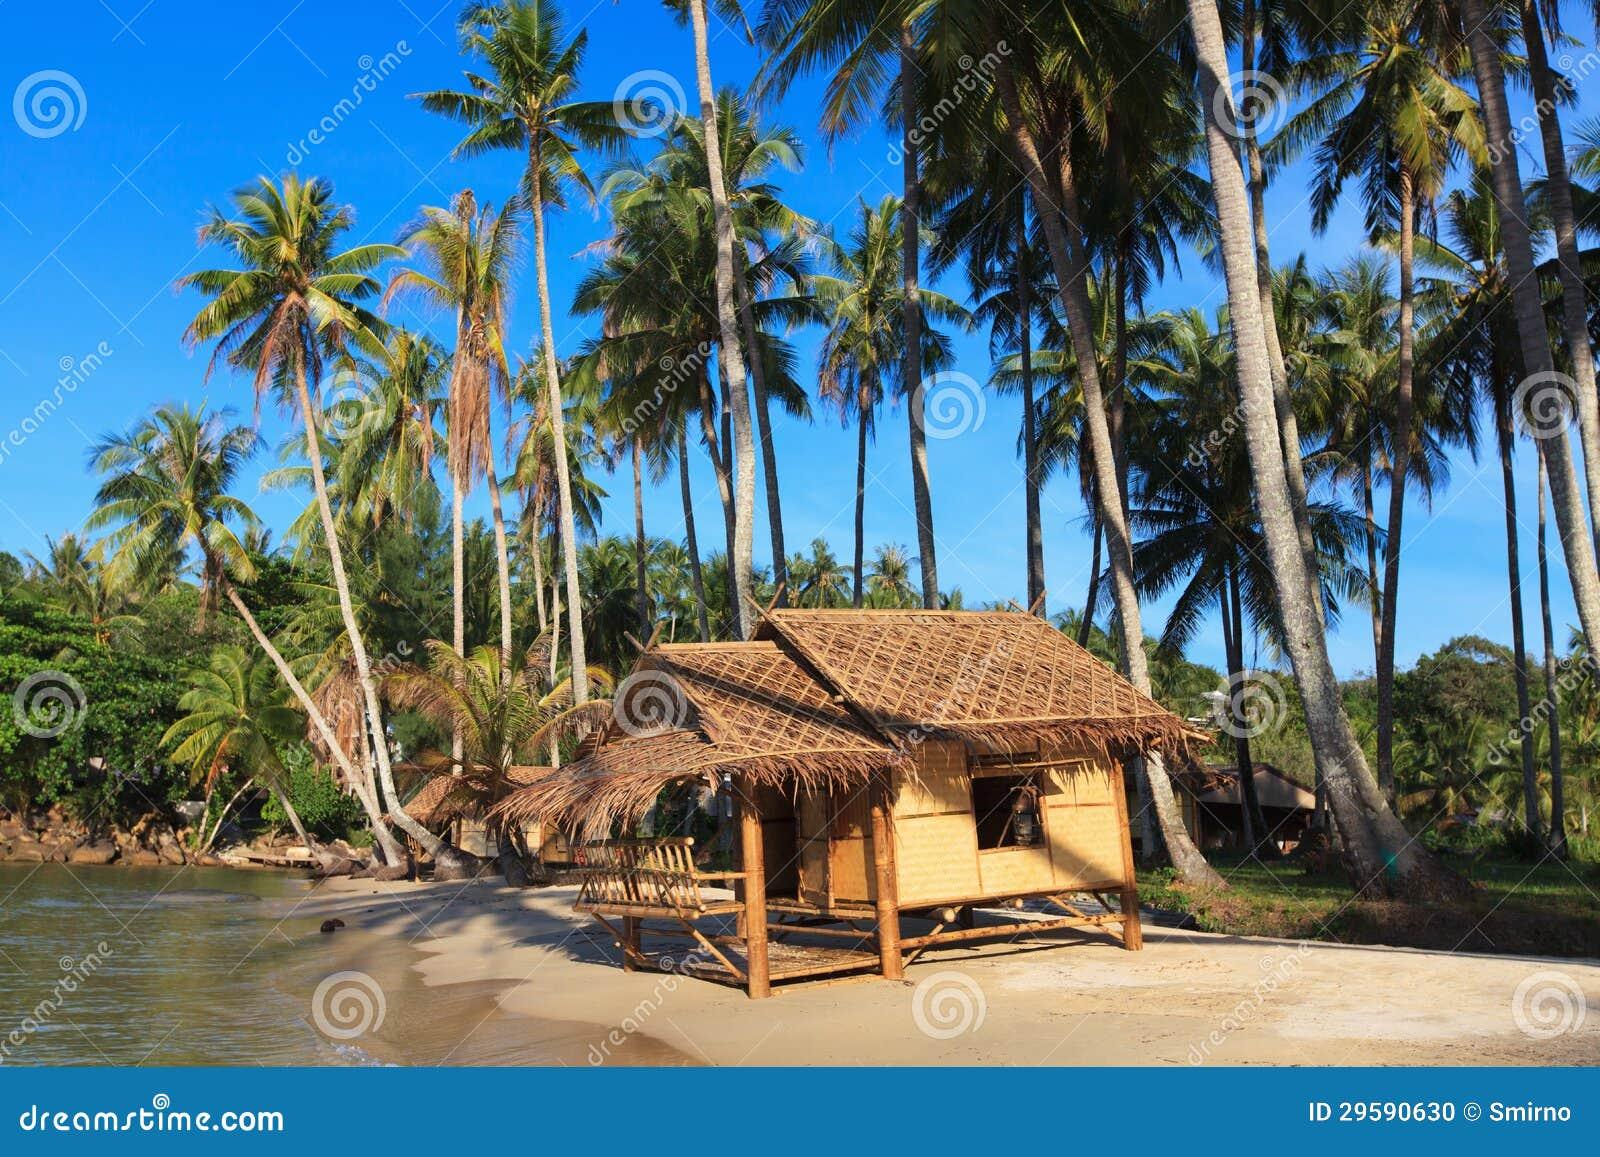 Tropical Beach Huts: Beautiful Tropical Beach With White Sandy Beach From